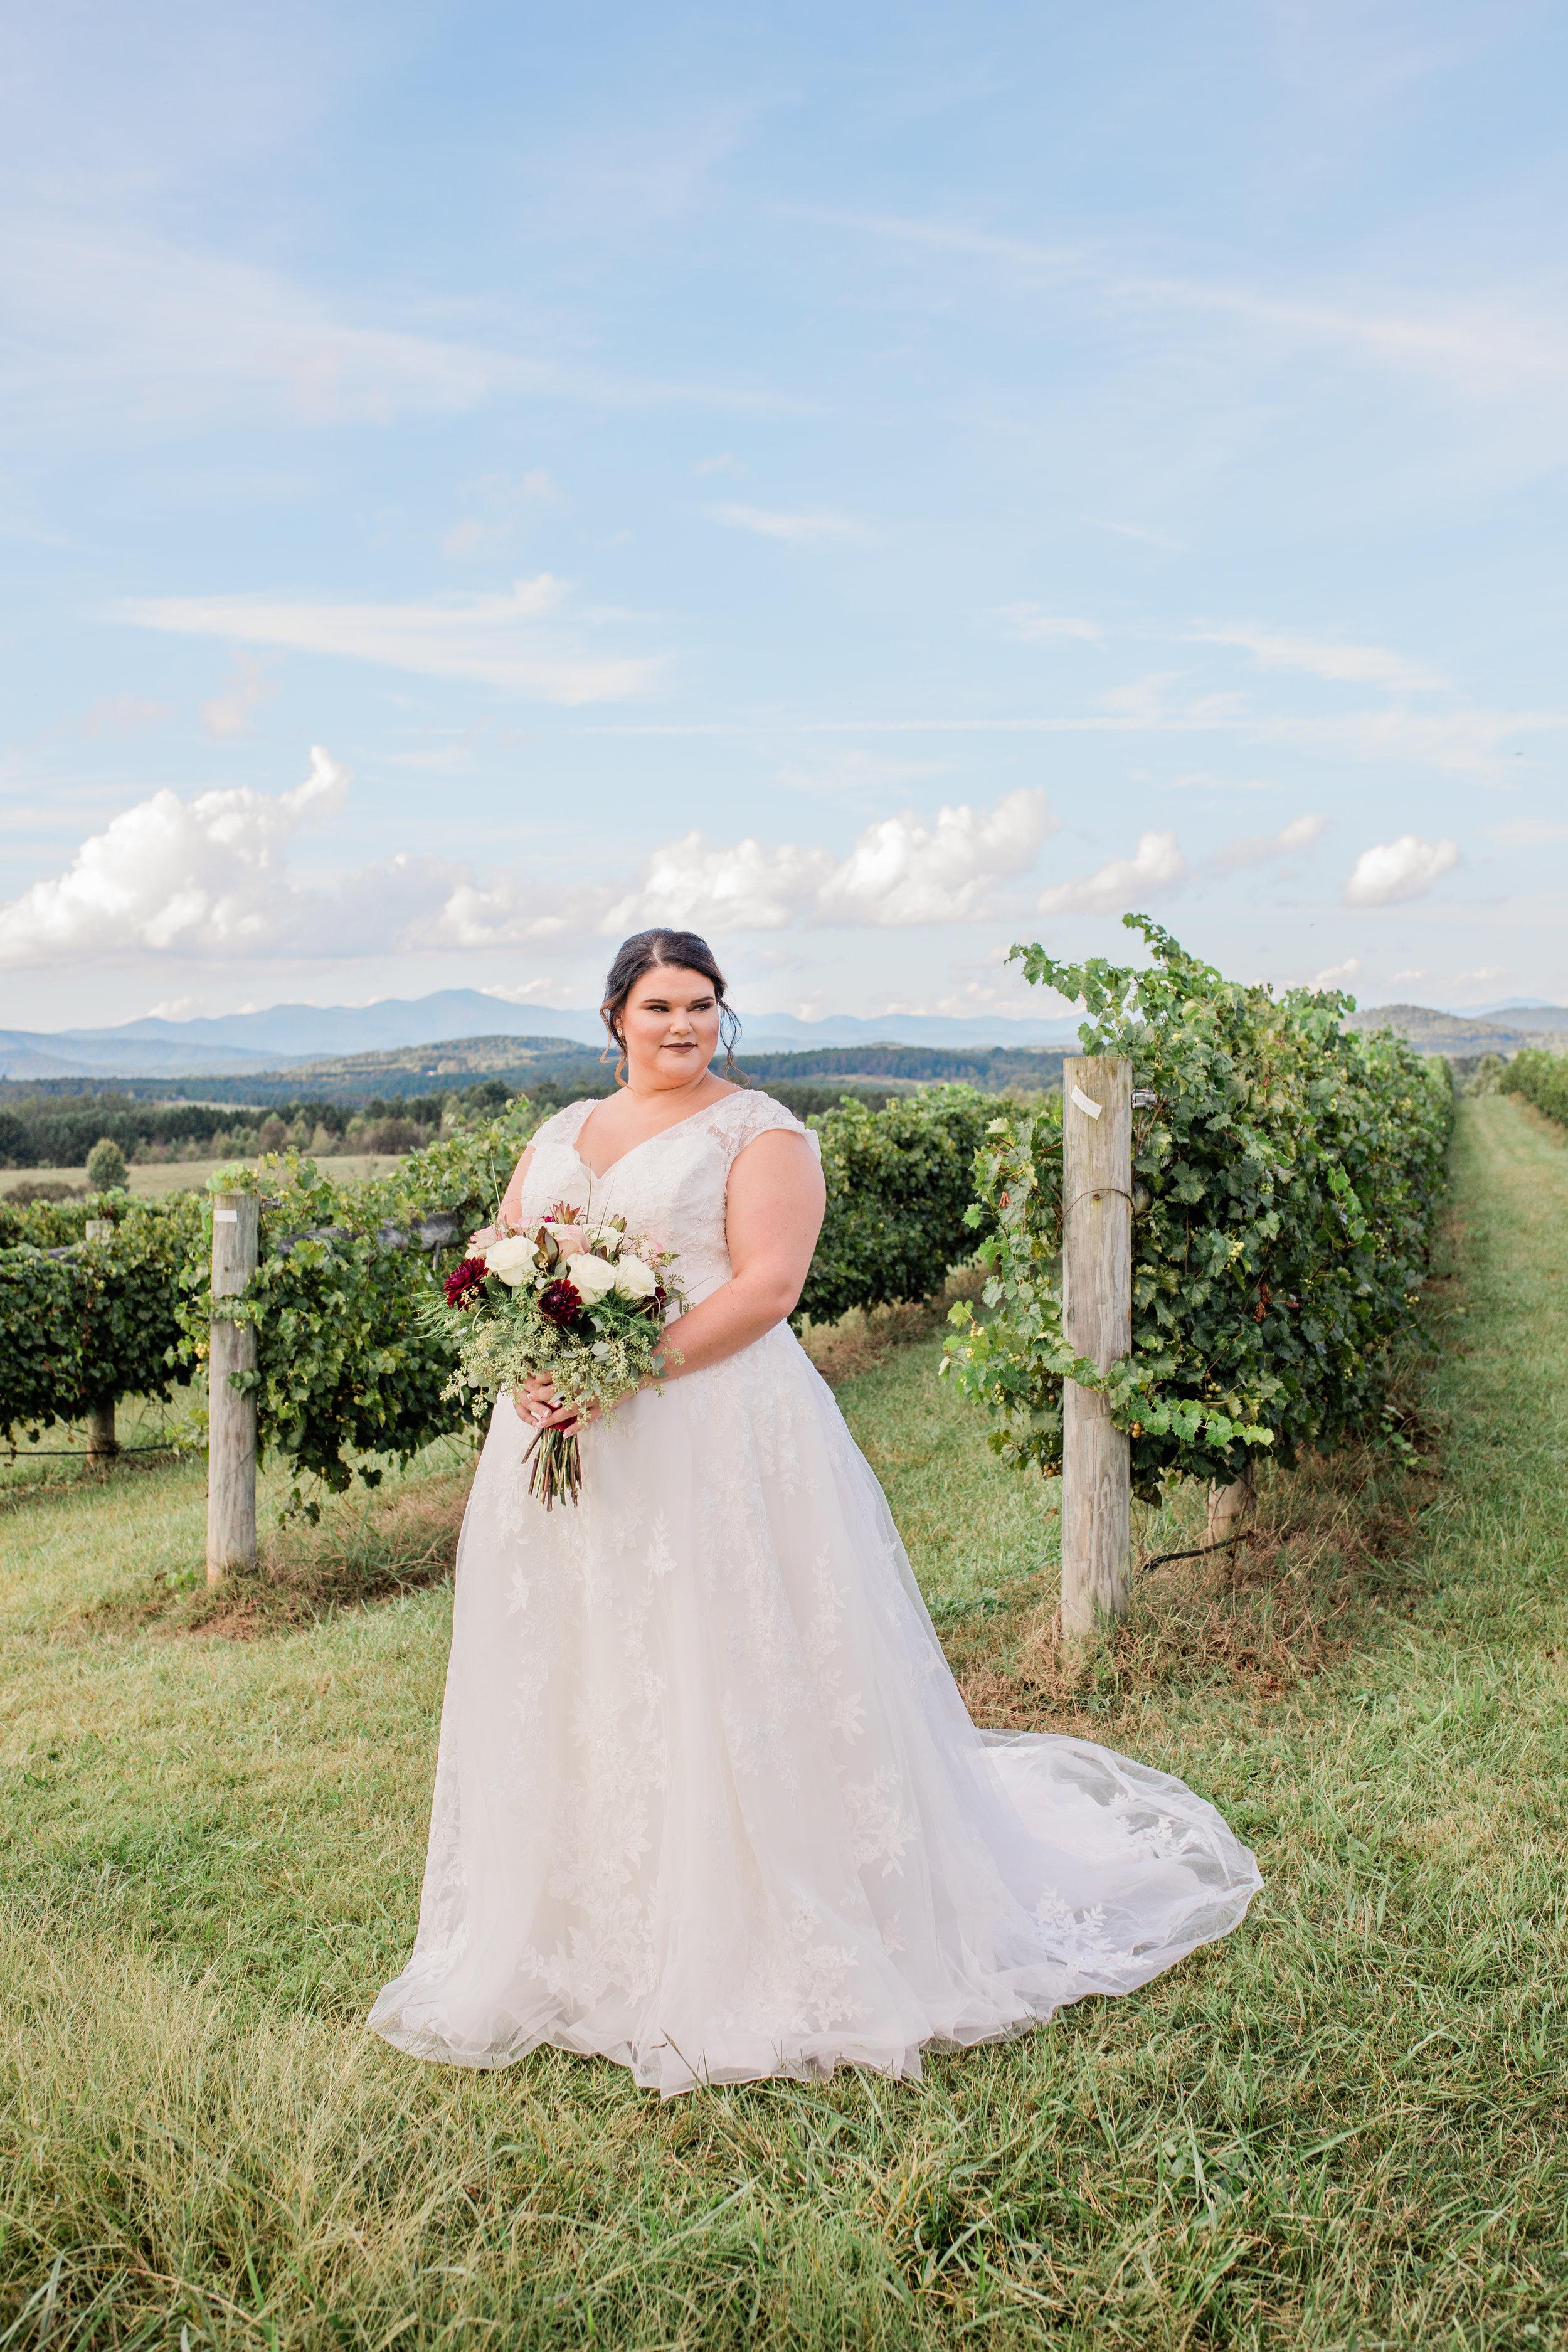 Brandi | Chattooga Belle Farm